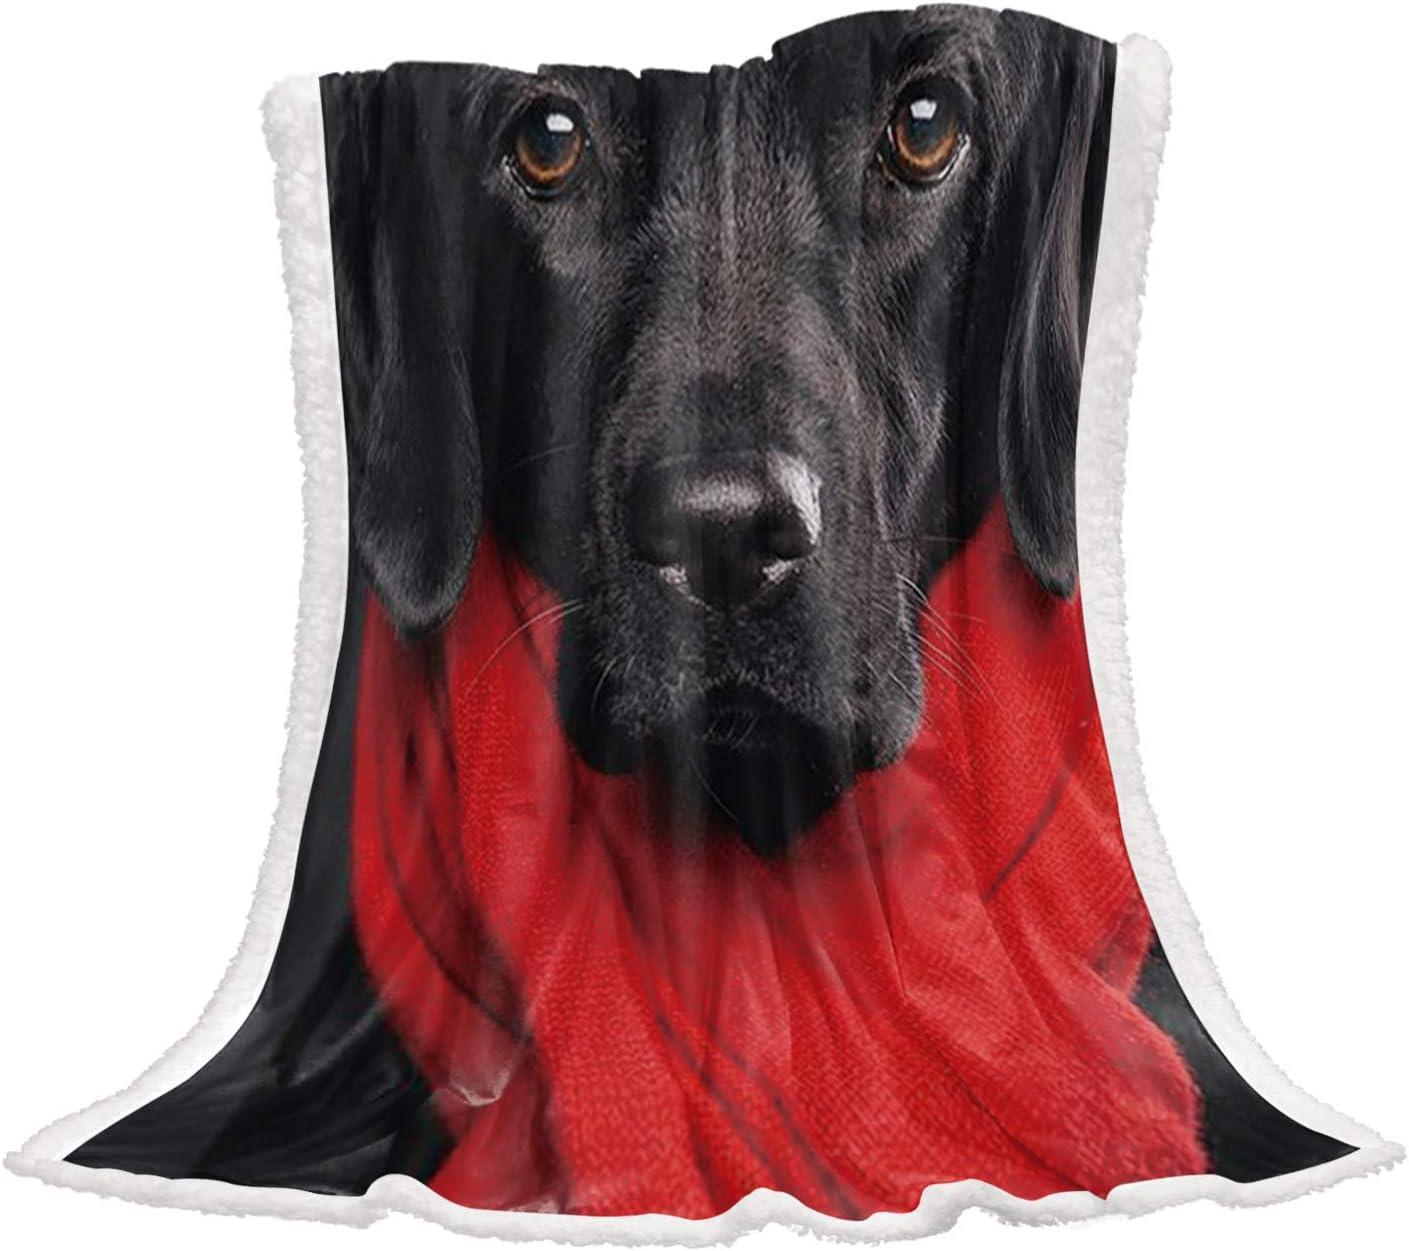 買取 Futuregrace ☆正規品新品未使用品 Lovely Labrador Black Dog Pattern Warm Throw Fleece